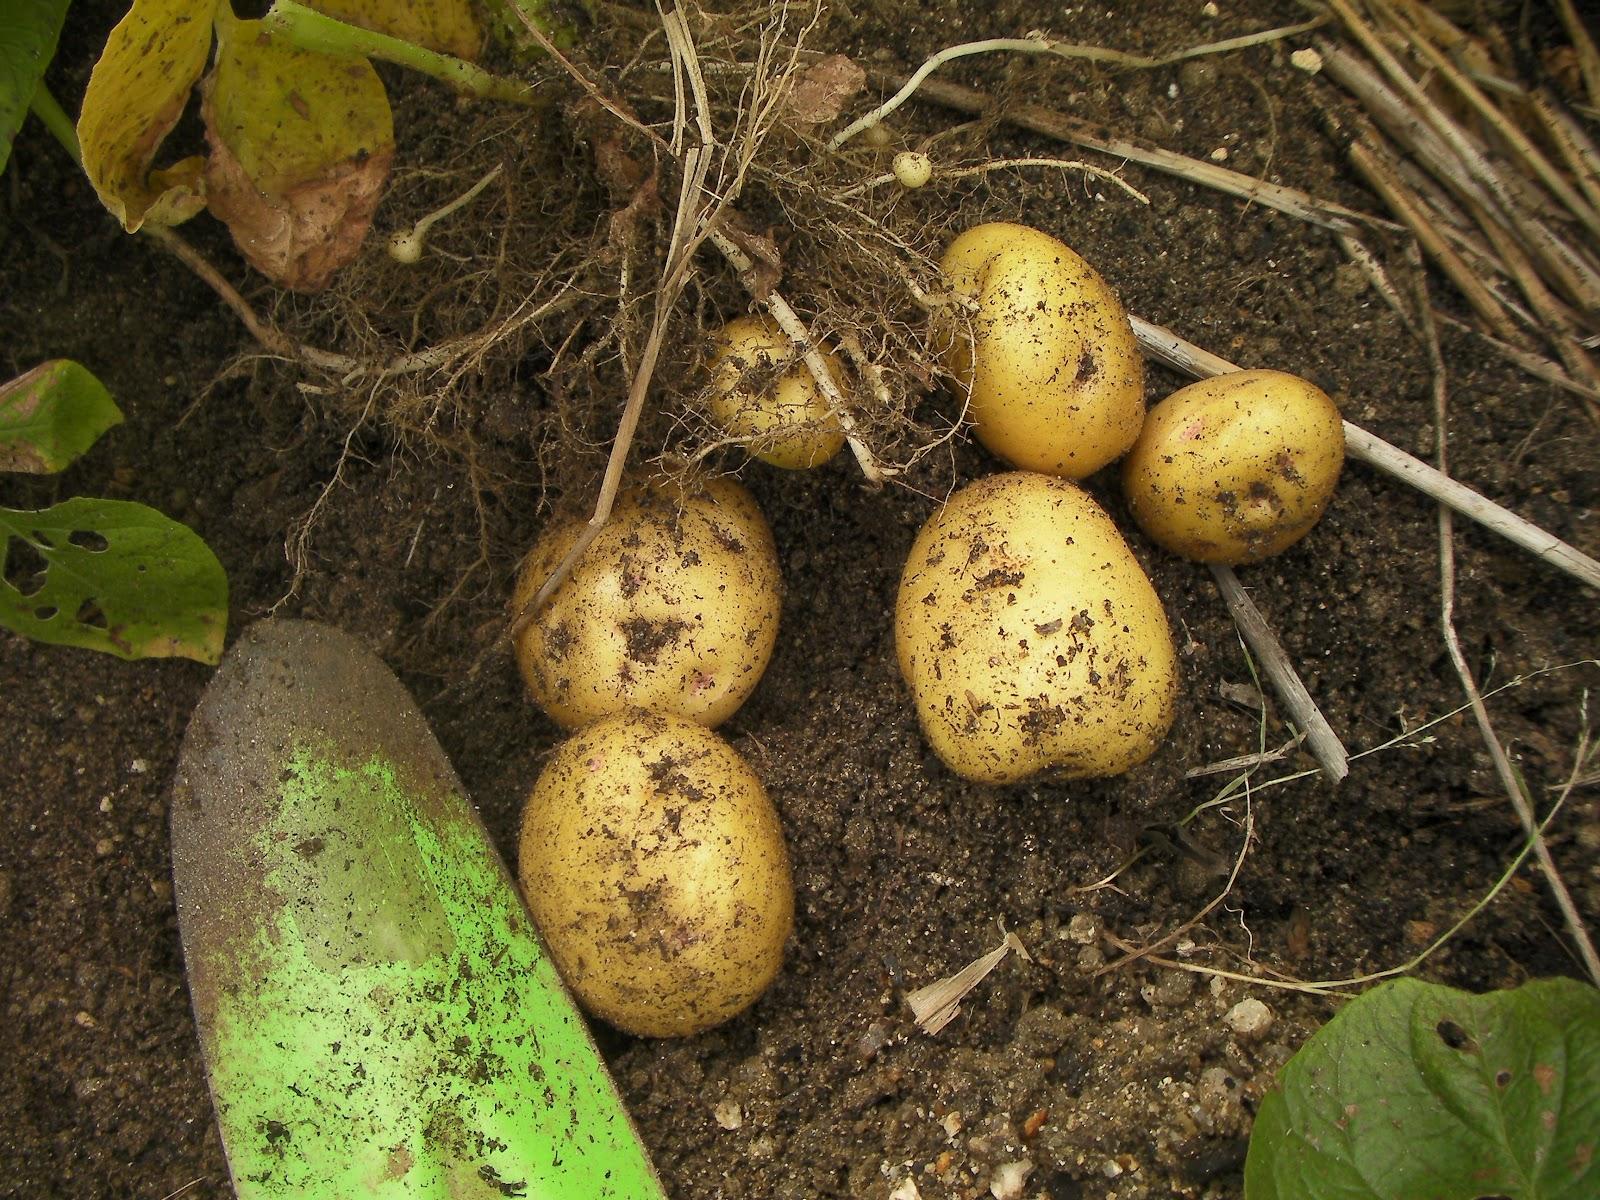 Small vege garden in a suburb: Harvesting potatoes in a rainy season